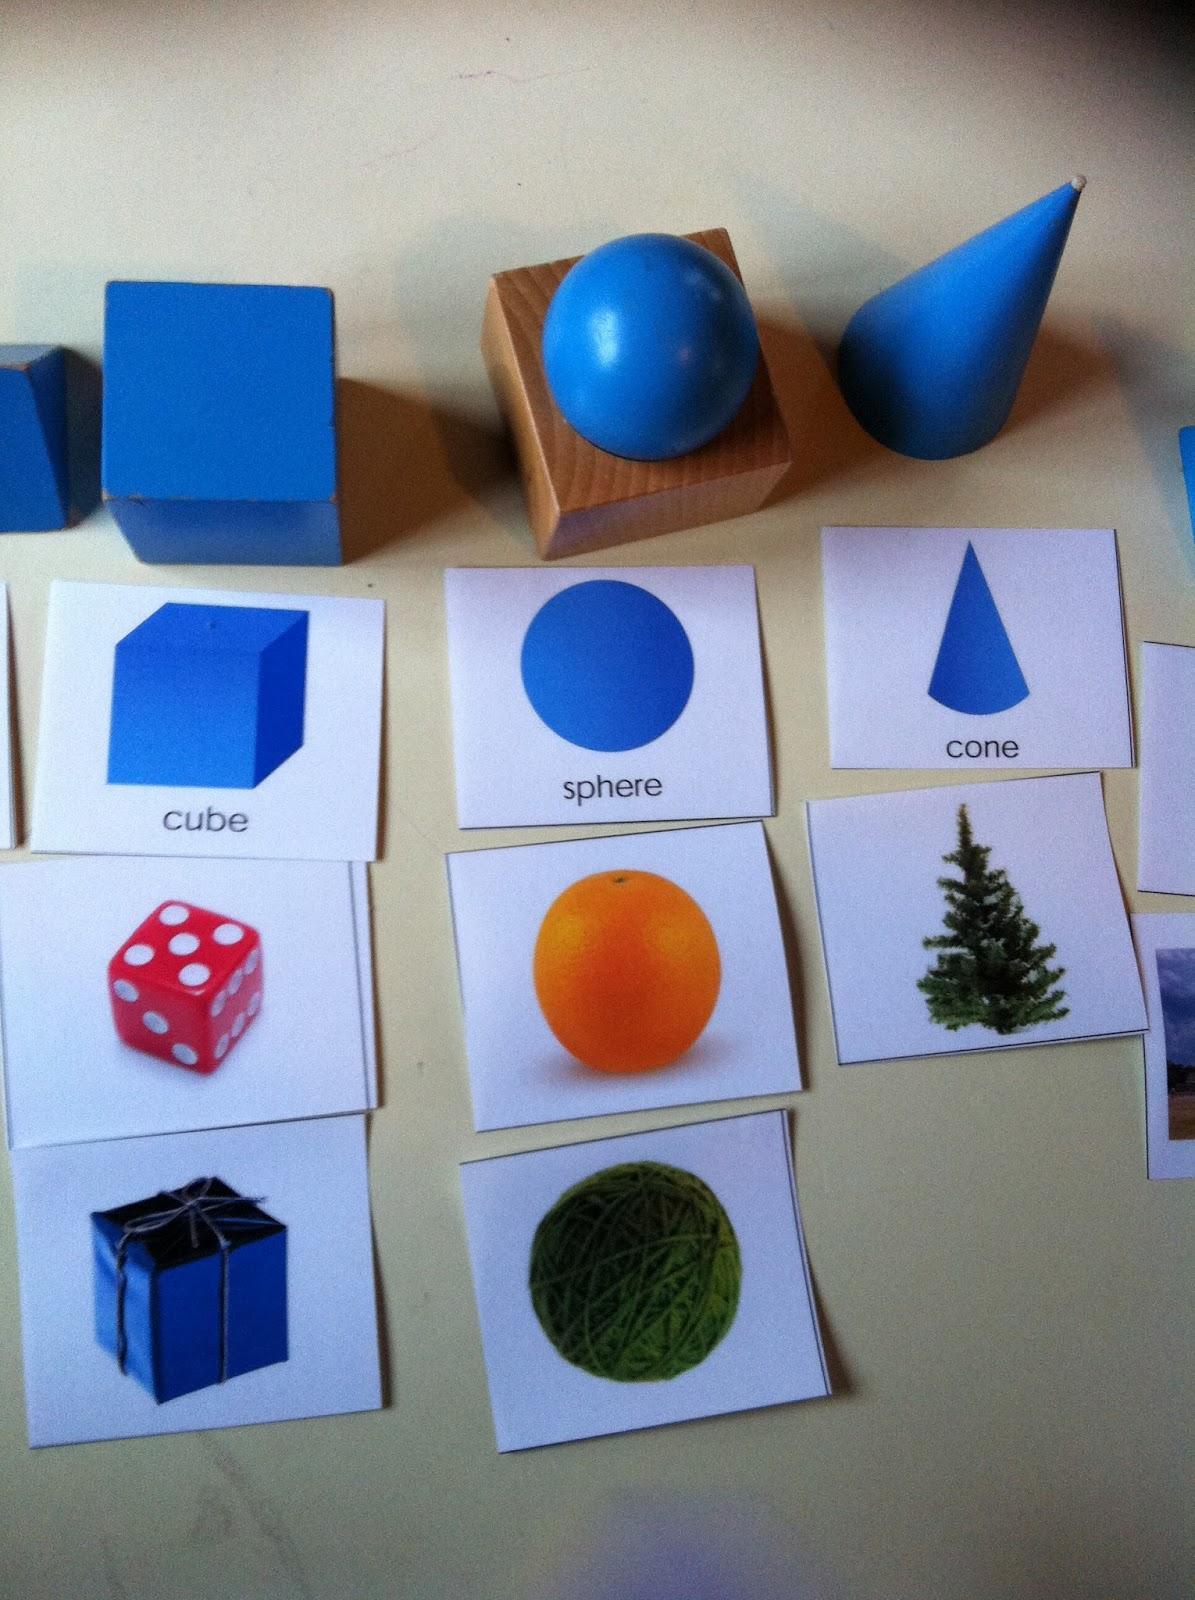 The Guilletos Playful Learning Unispiring Geometric